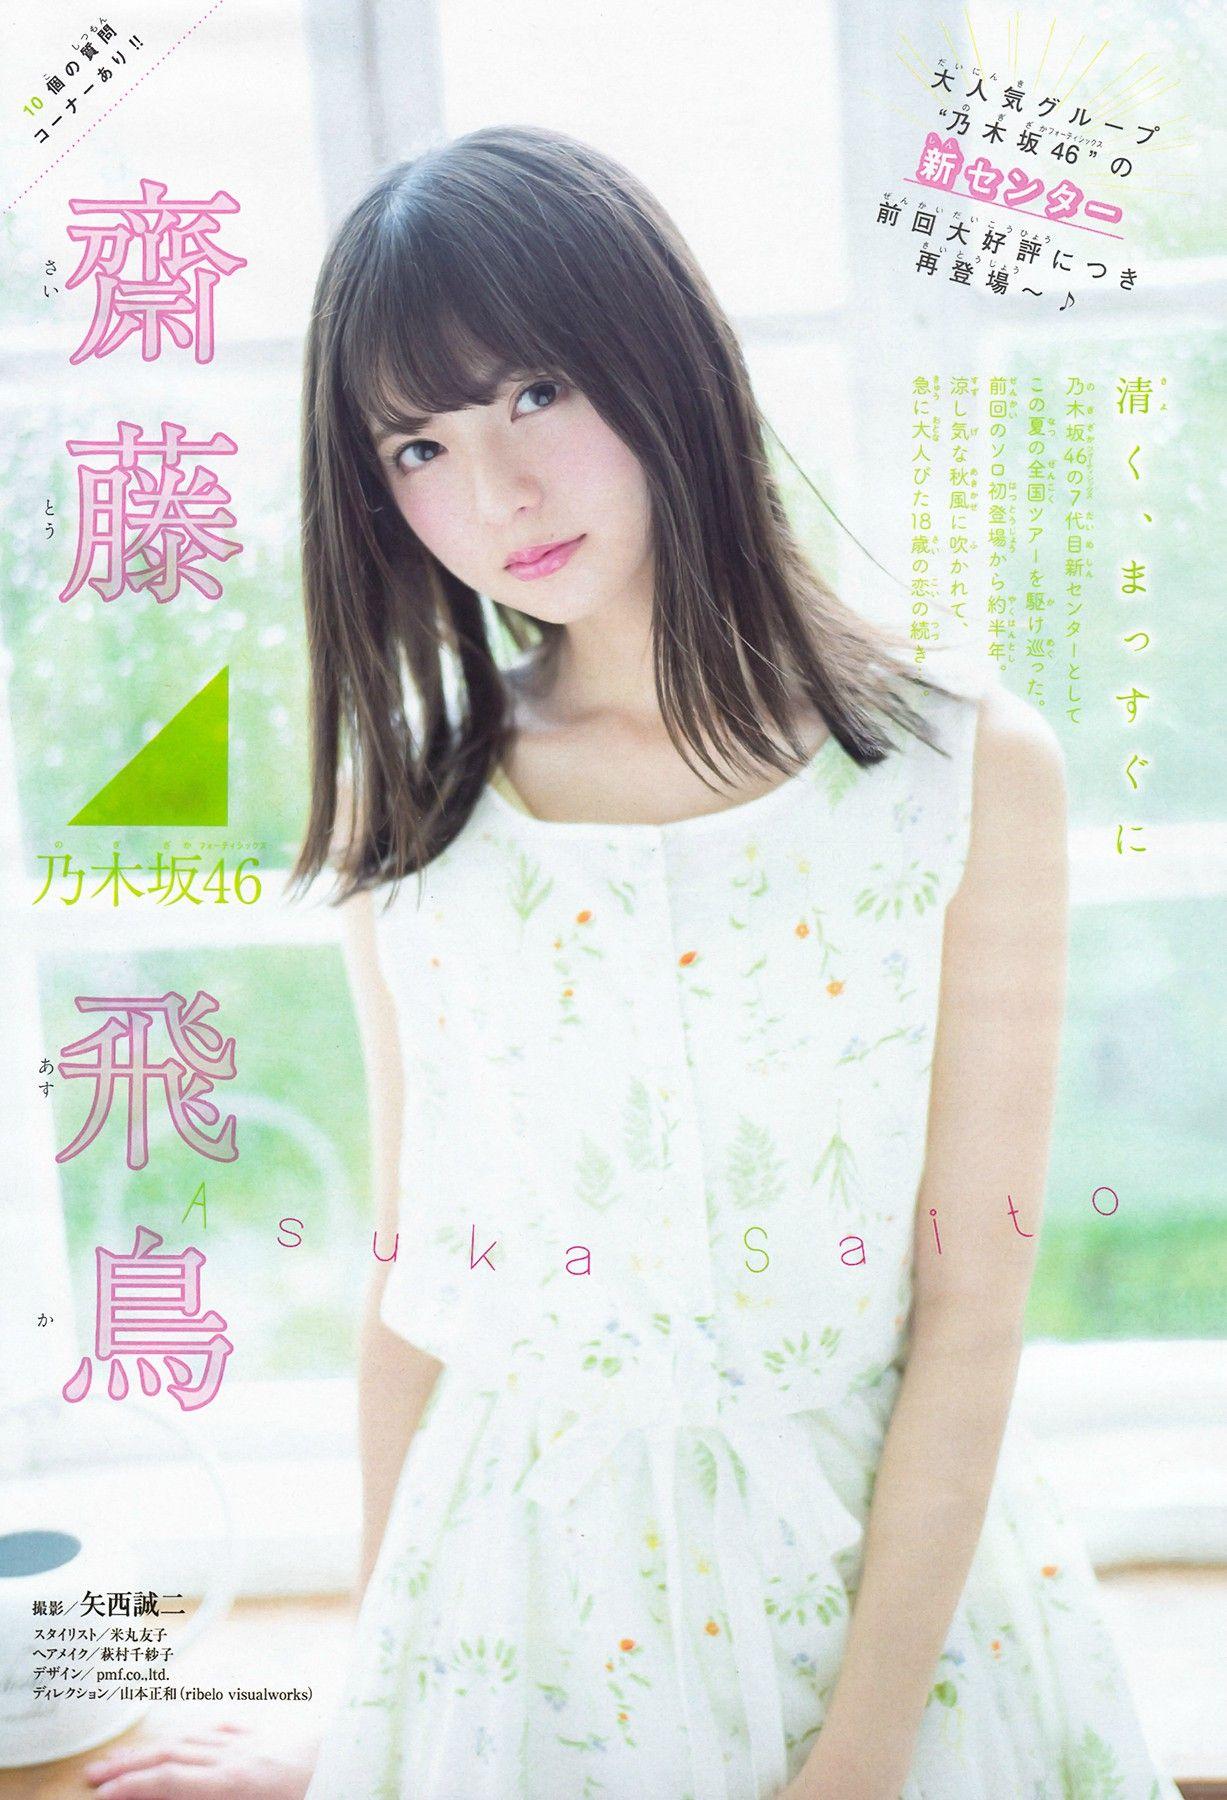 omiansary: 週刊少年マガジン第42 Asuka chan... | 日々是遊楽也